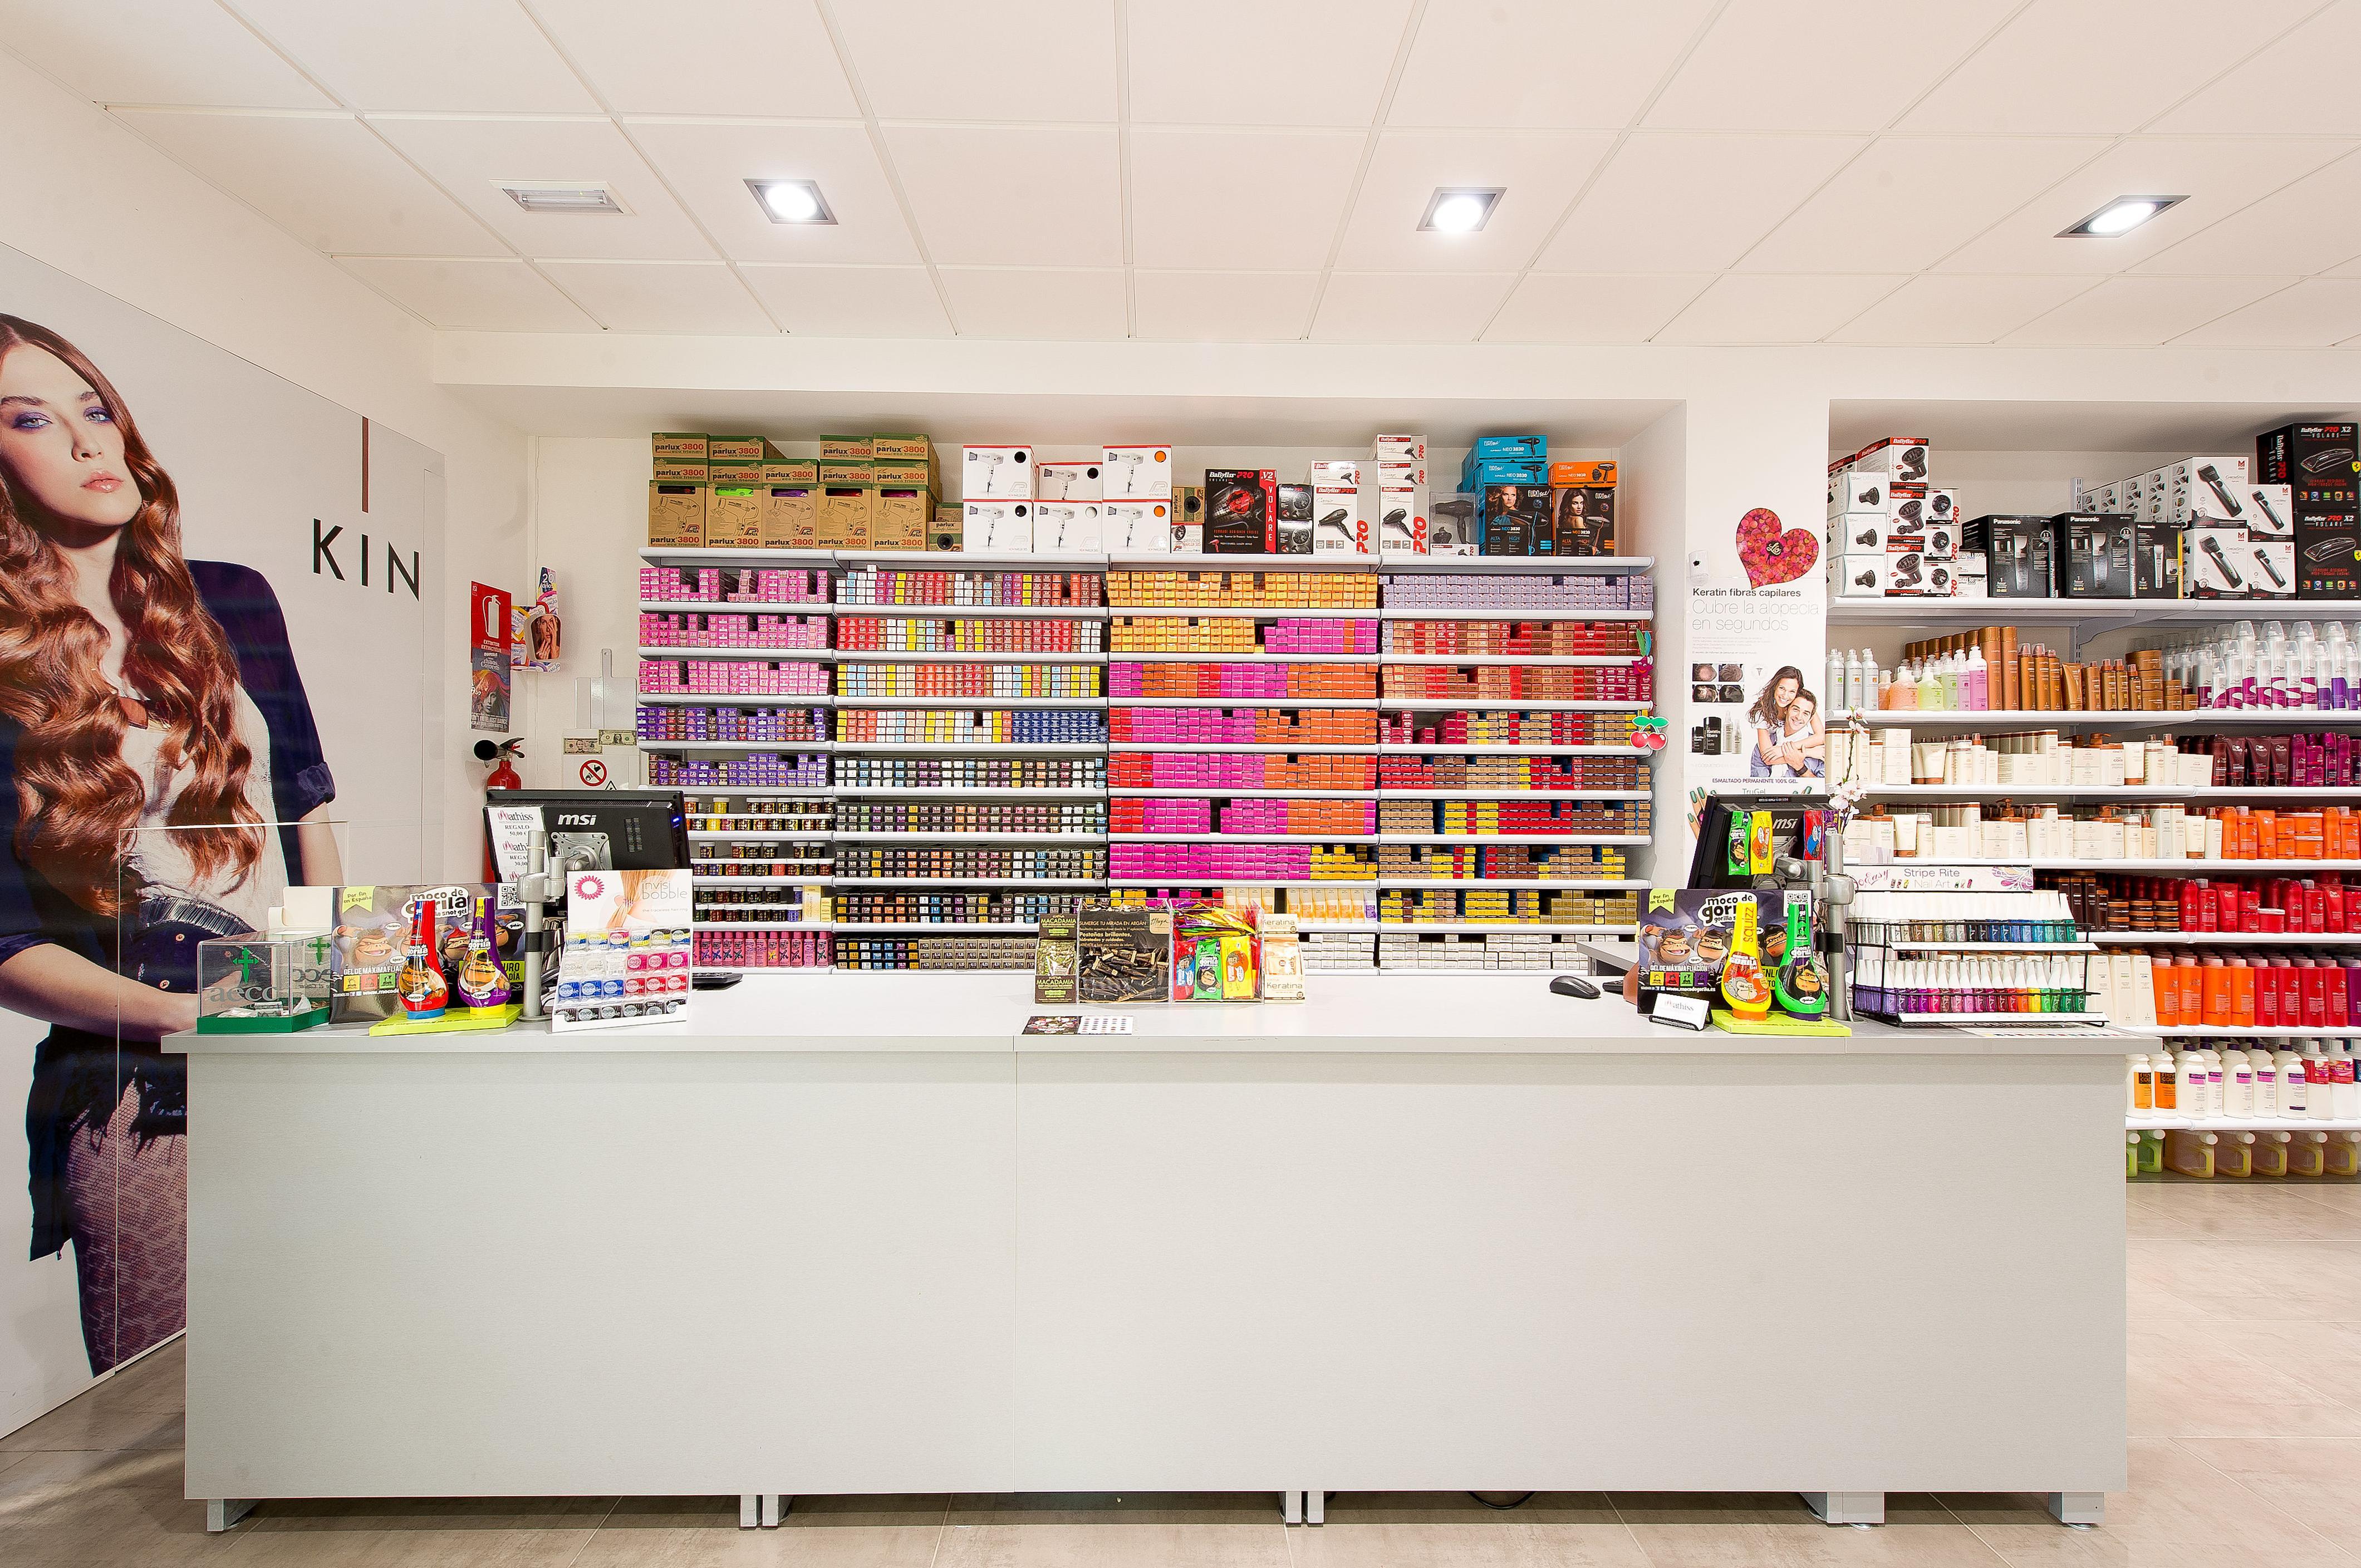 Foto 22 de Suministros para peluquerías y estética  en Ibiza | Mathiss